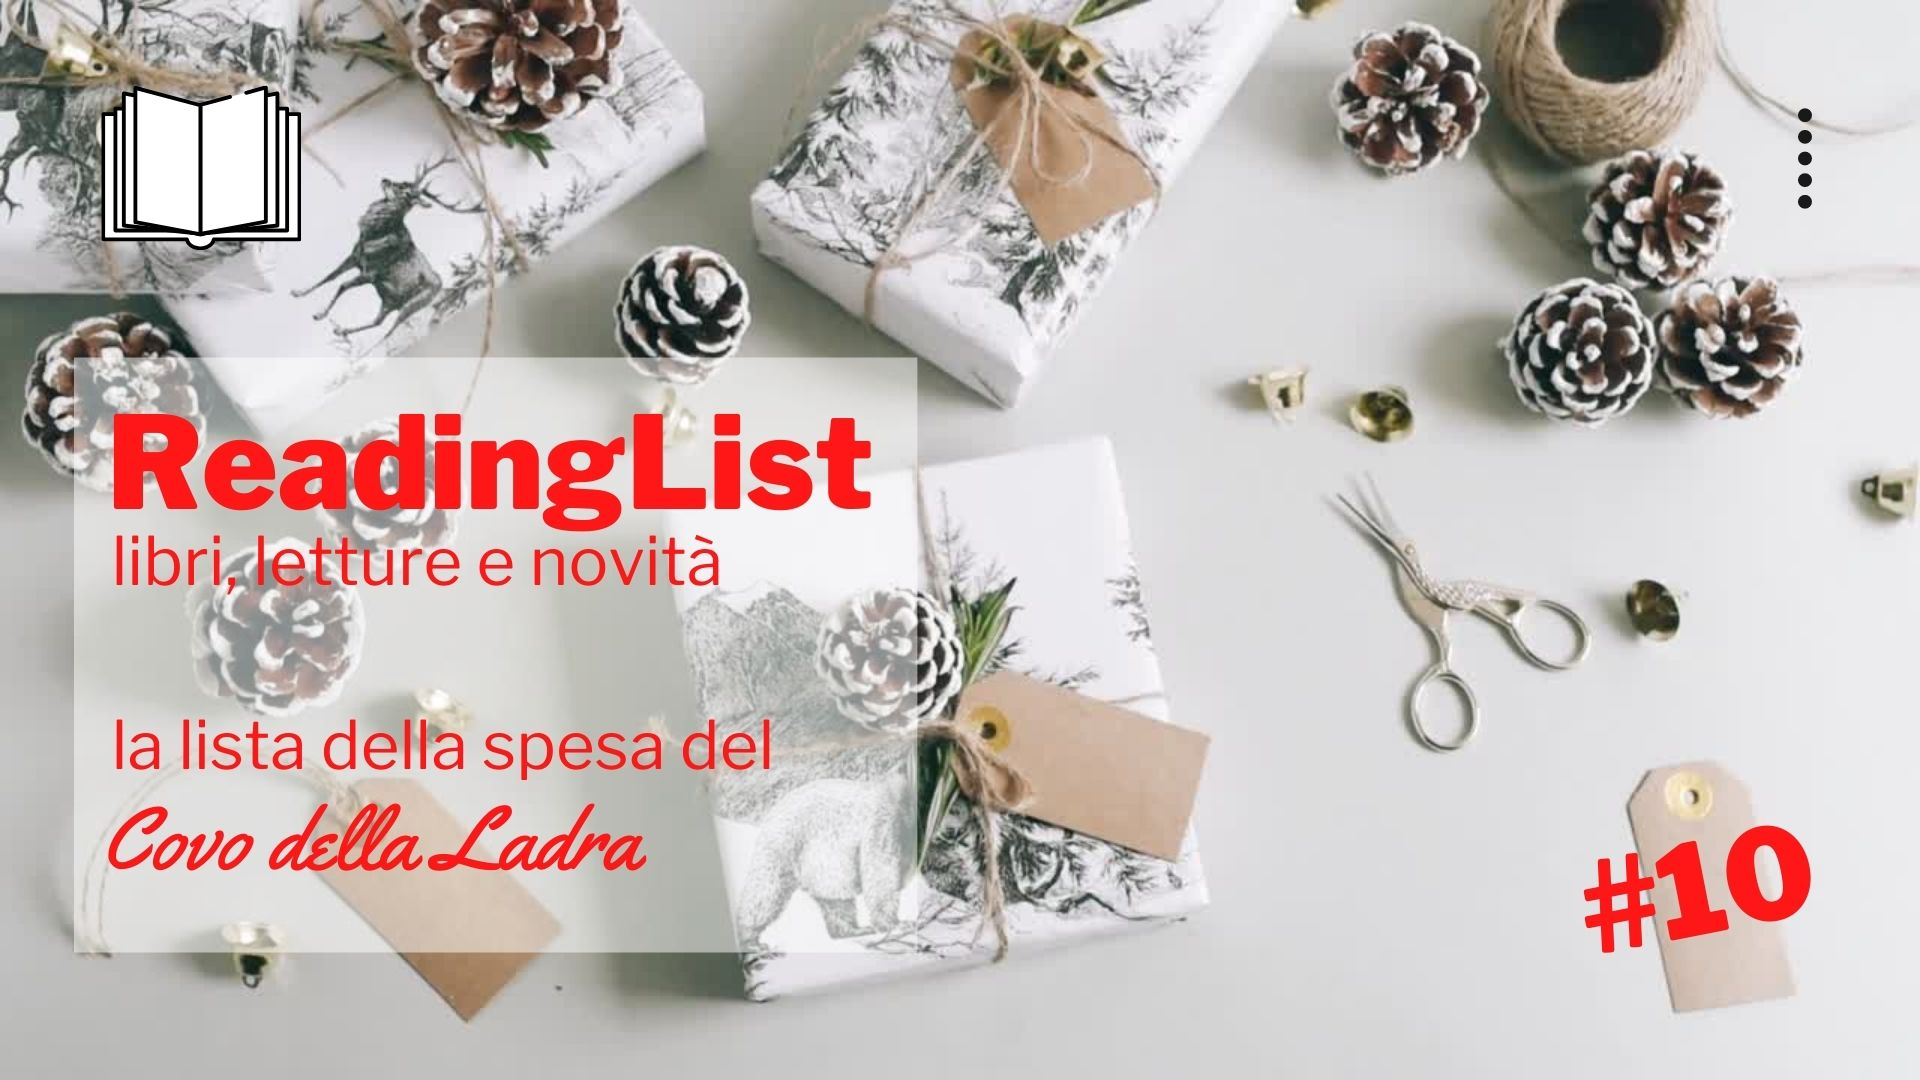 Reading List 10